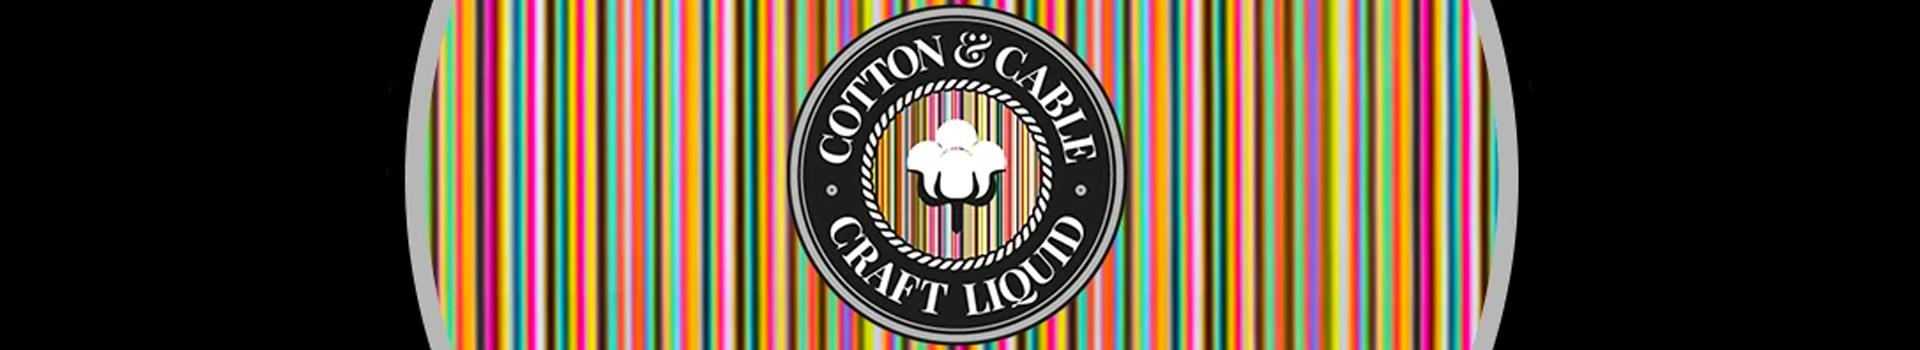 Cotton & Cable